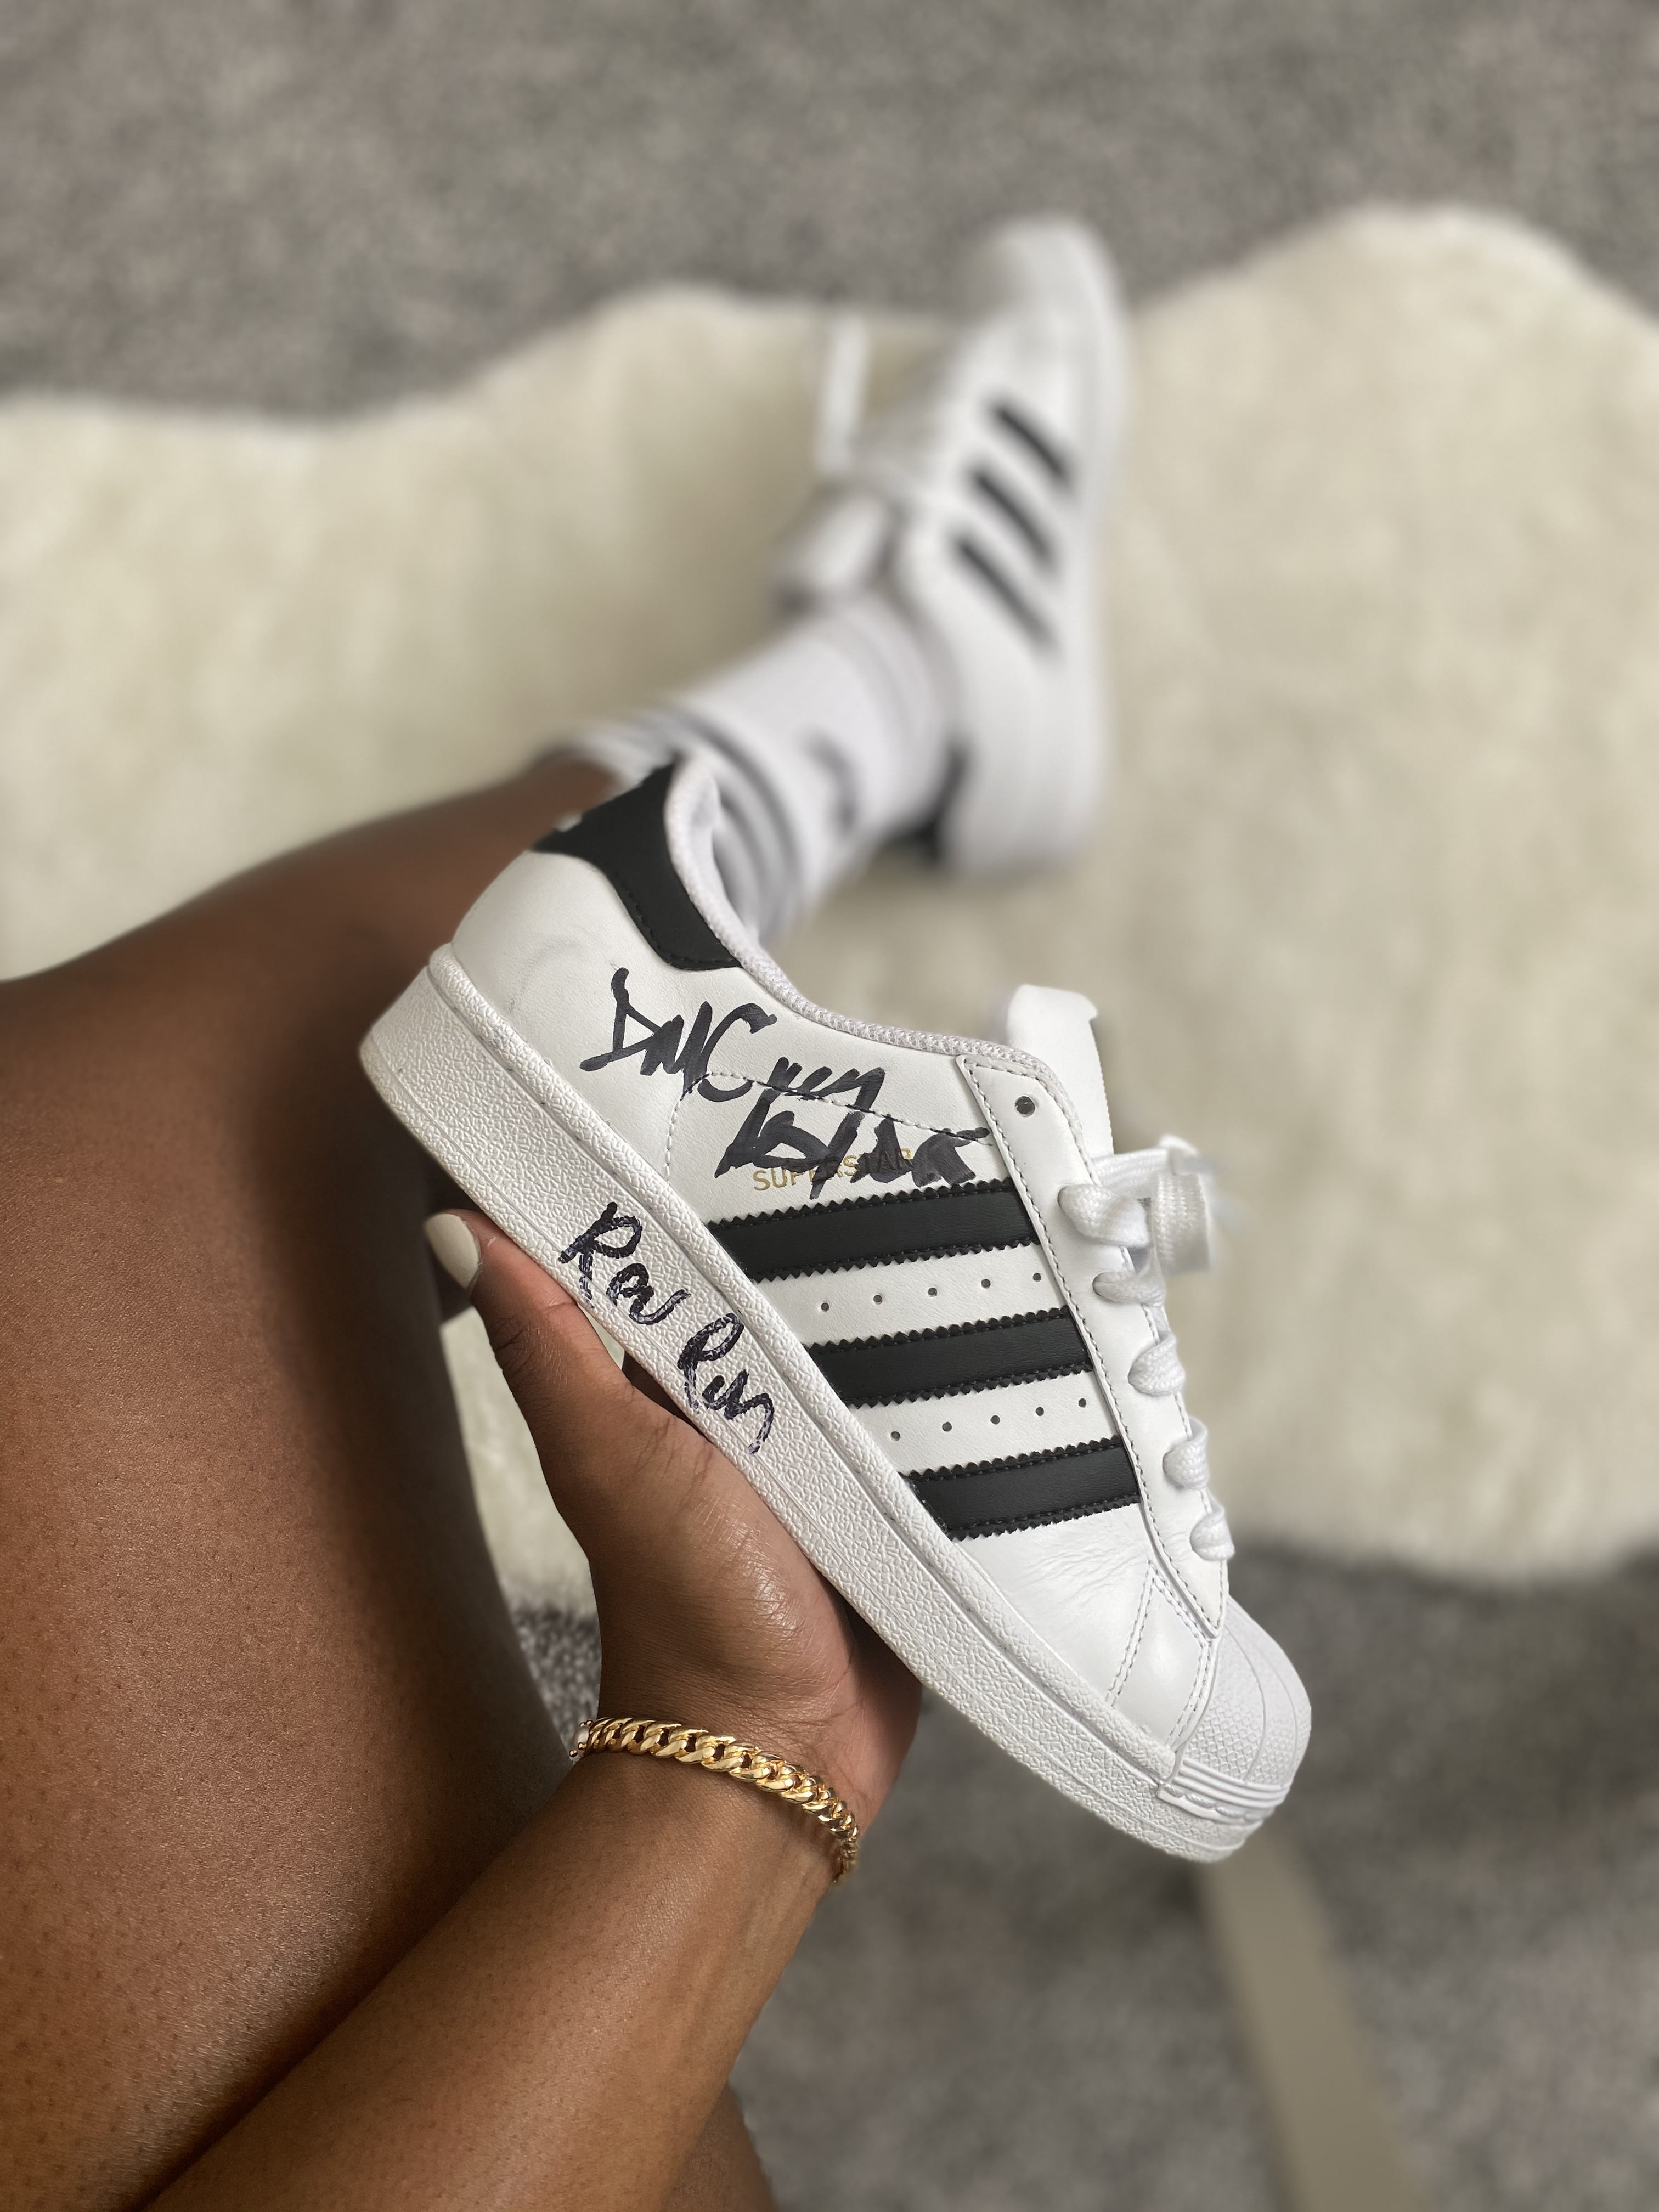 adidas Originals Superstar - signed by Run-DMC